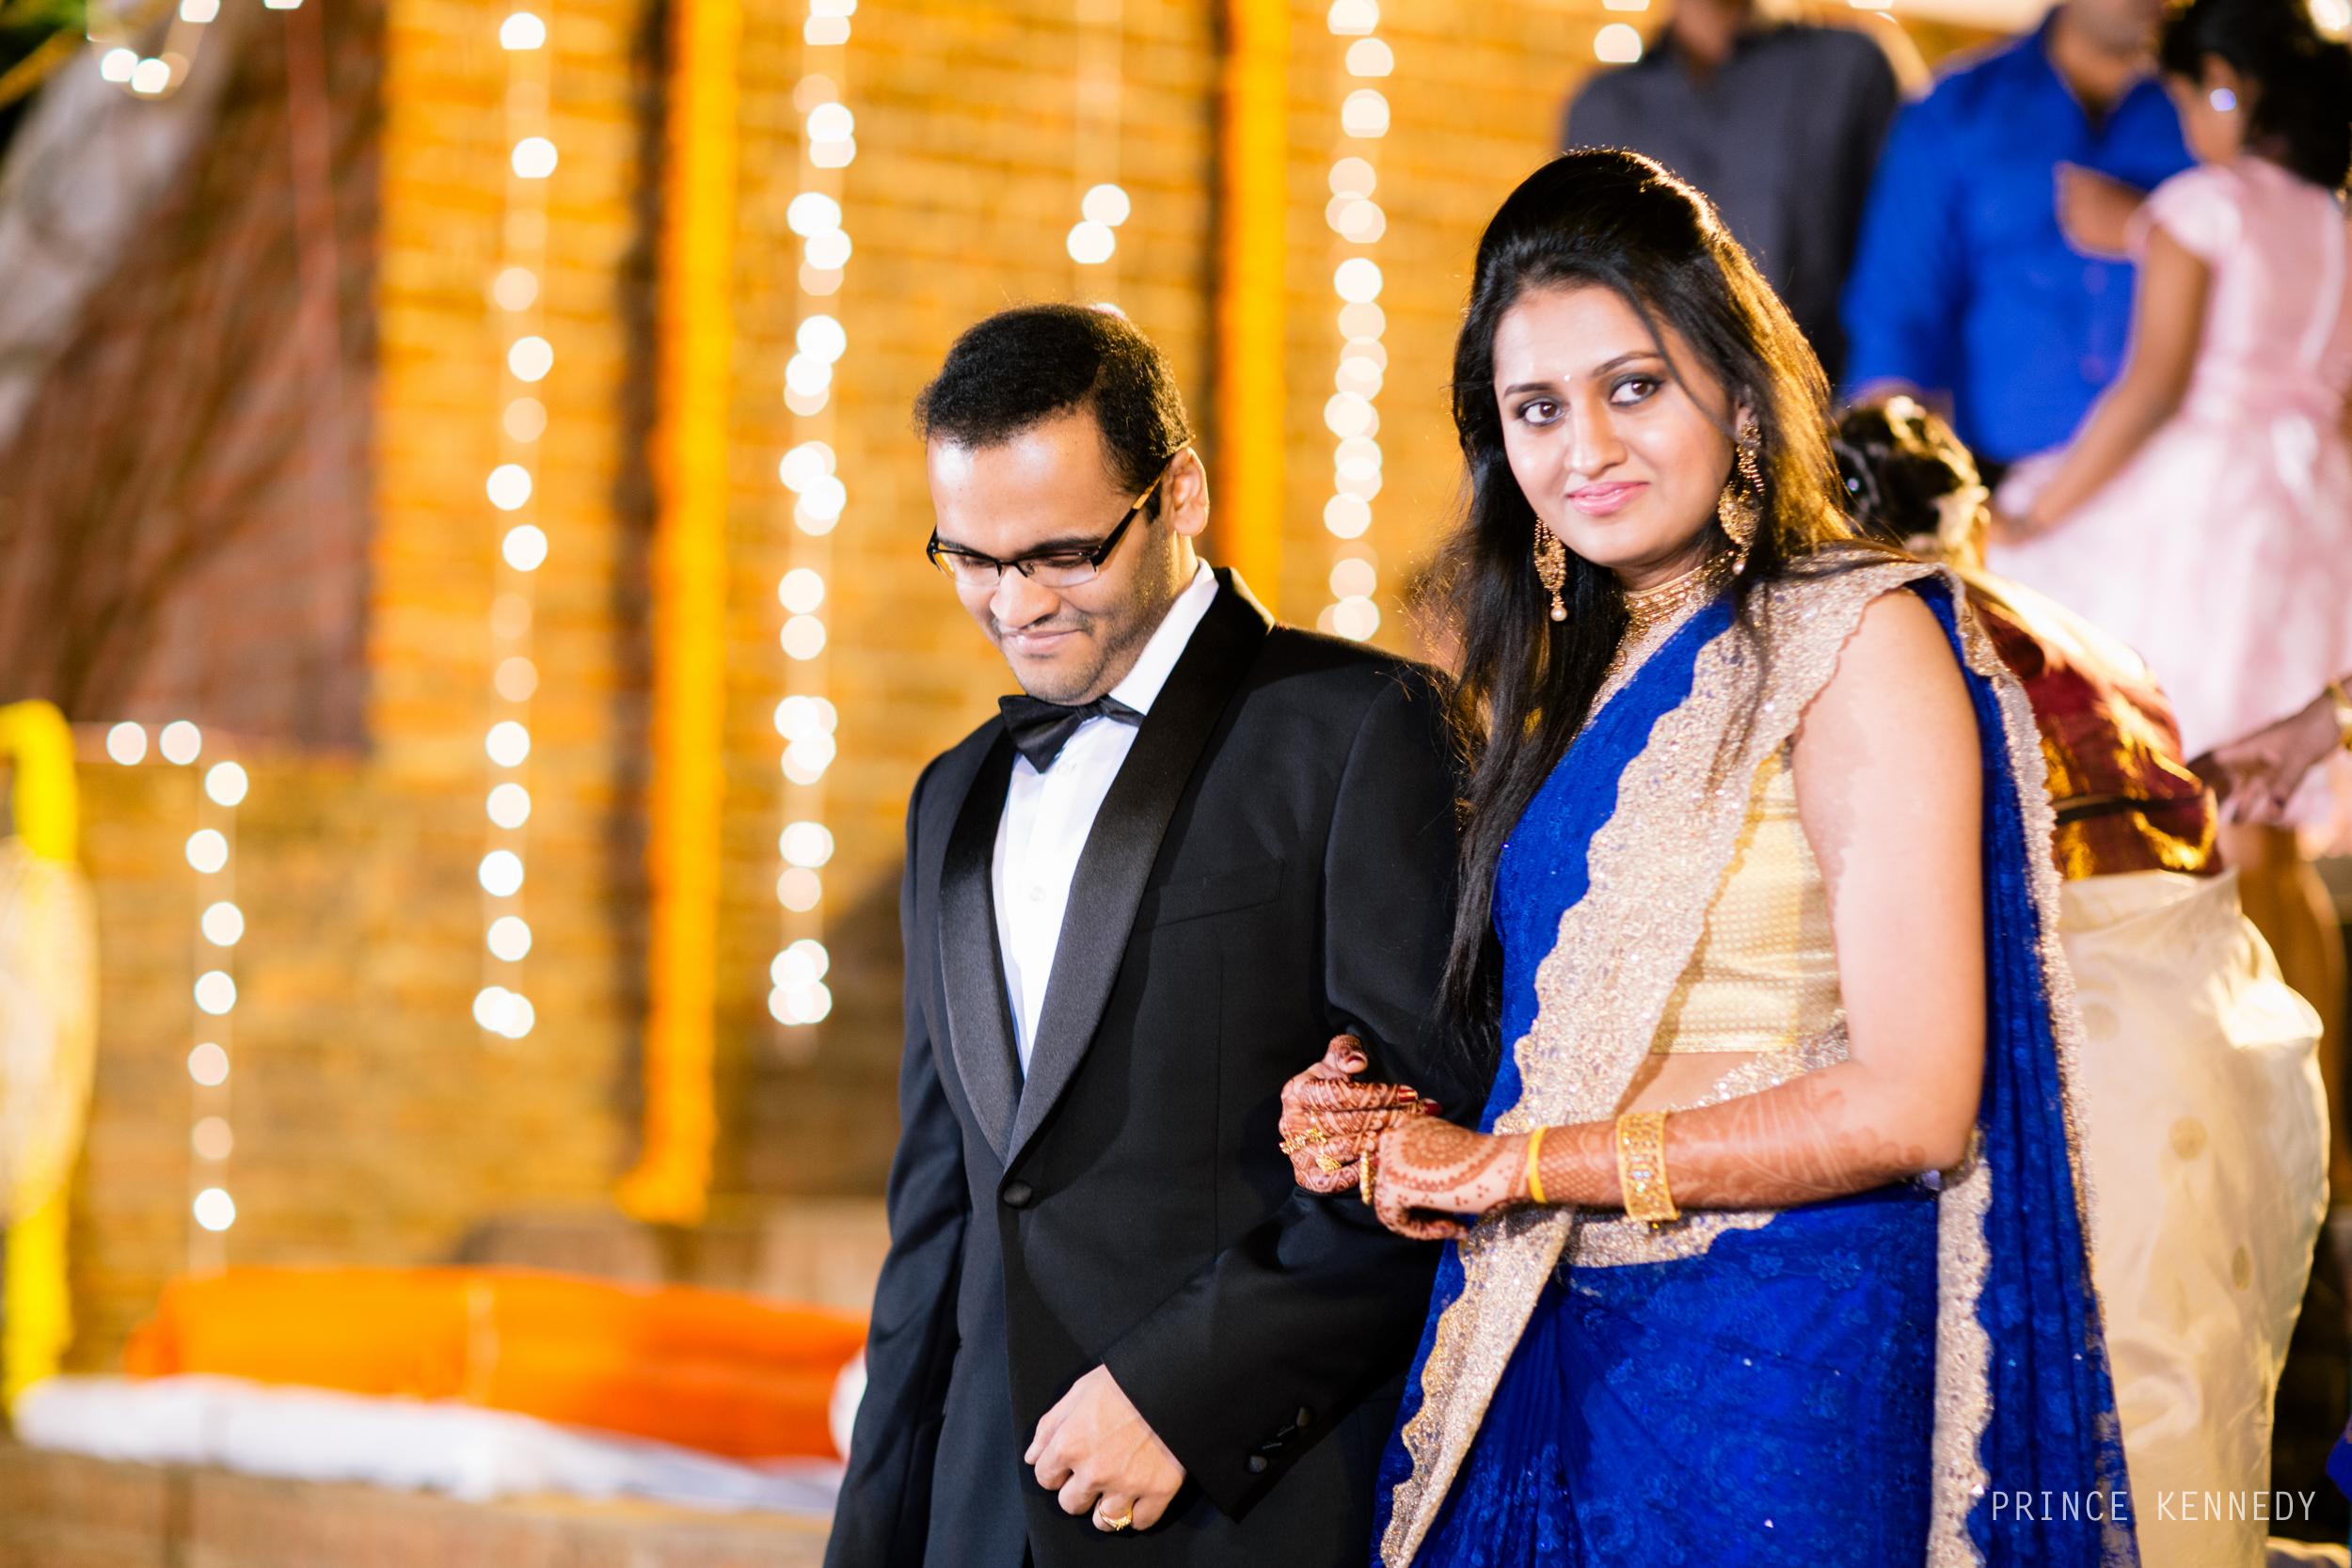 Athmajja-Nithesh-Engagement-Couple-Portrait-Portraiture-Wedding-Couple-Portrait-Chennai-Photographer-Candid-Photography-Destination-Best-Prince-Kennedy-Photography-84.jpg